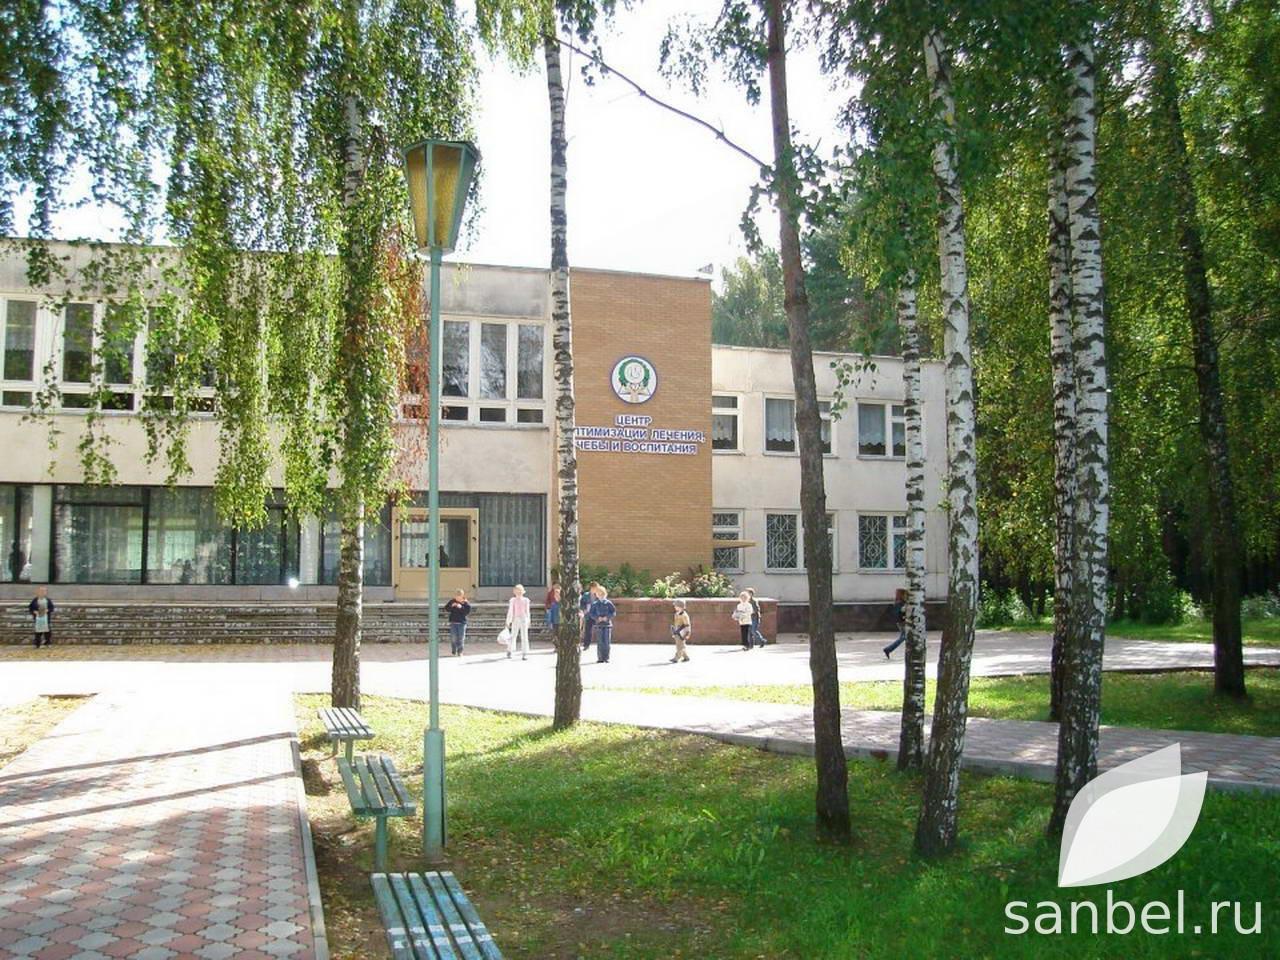 Туры в Санаторий Неман-72